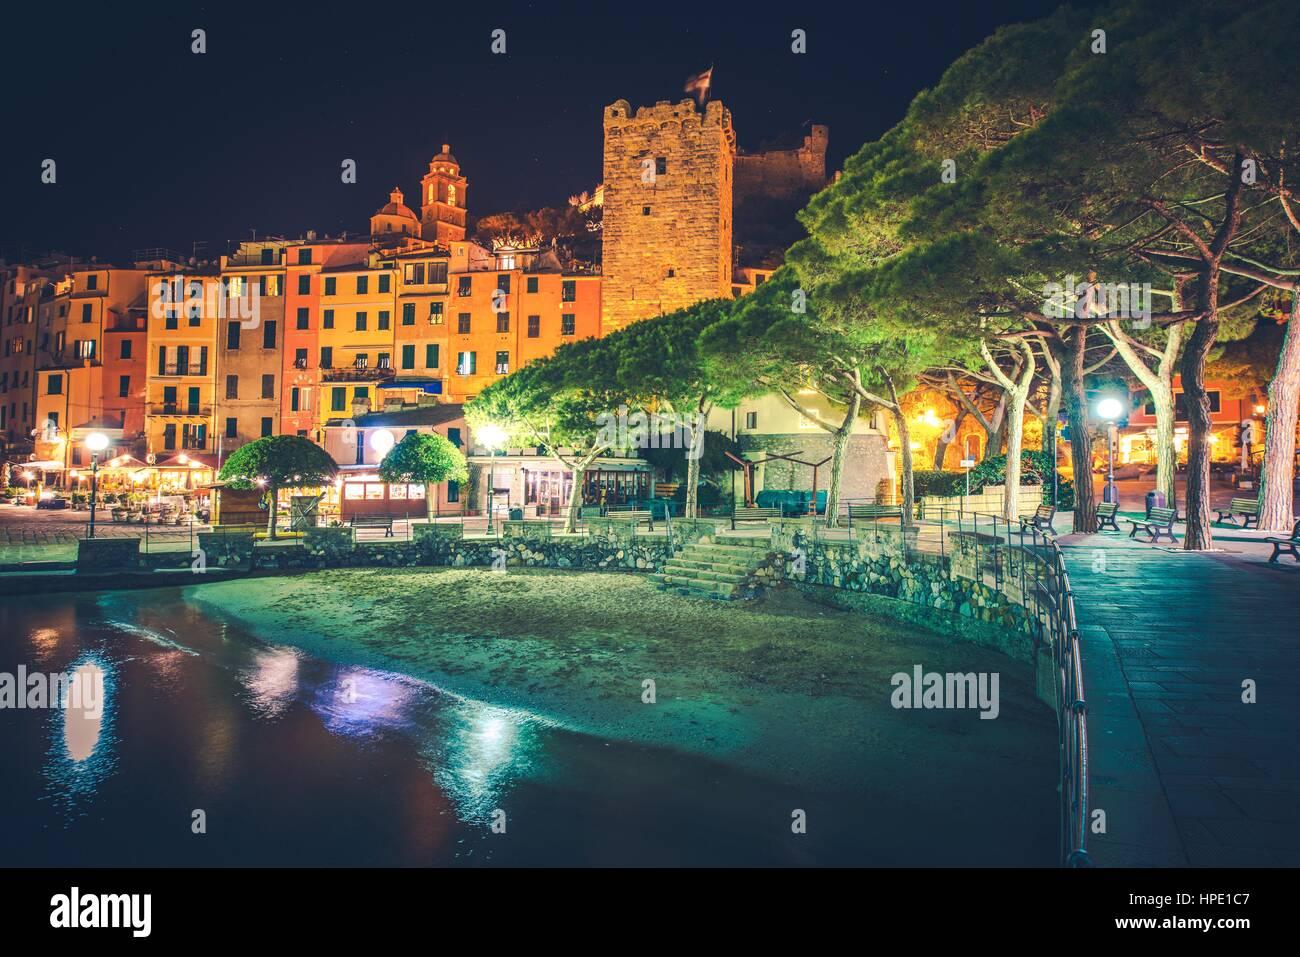 Famous Italian Riviera Porto Venere Night Scenery. Portovenere Illumination. La Spezia, Liguria, Italy. Part of - Stock Image